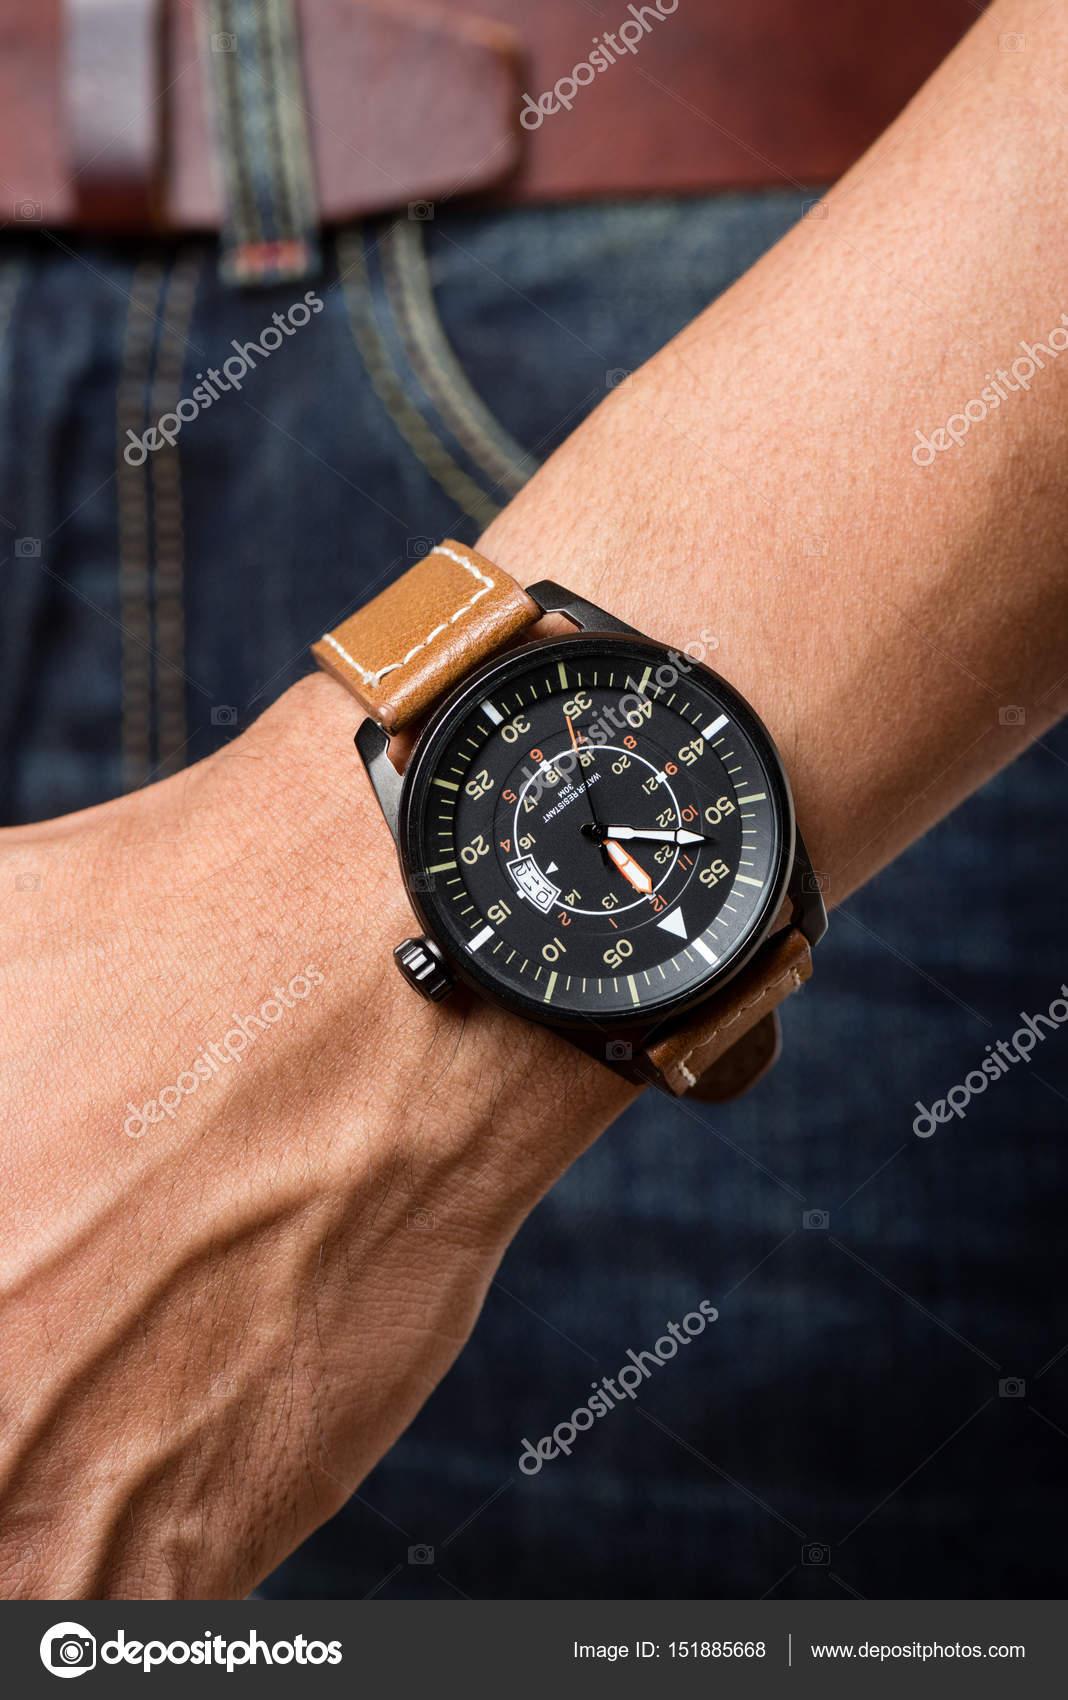 7386fbb85502 reloj de pulsera en la muñeca del hombre — Foto de stock ...